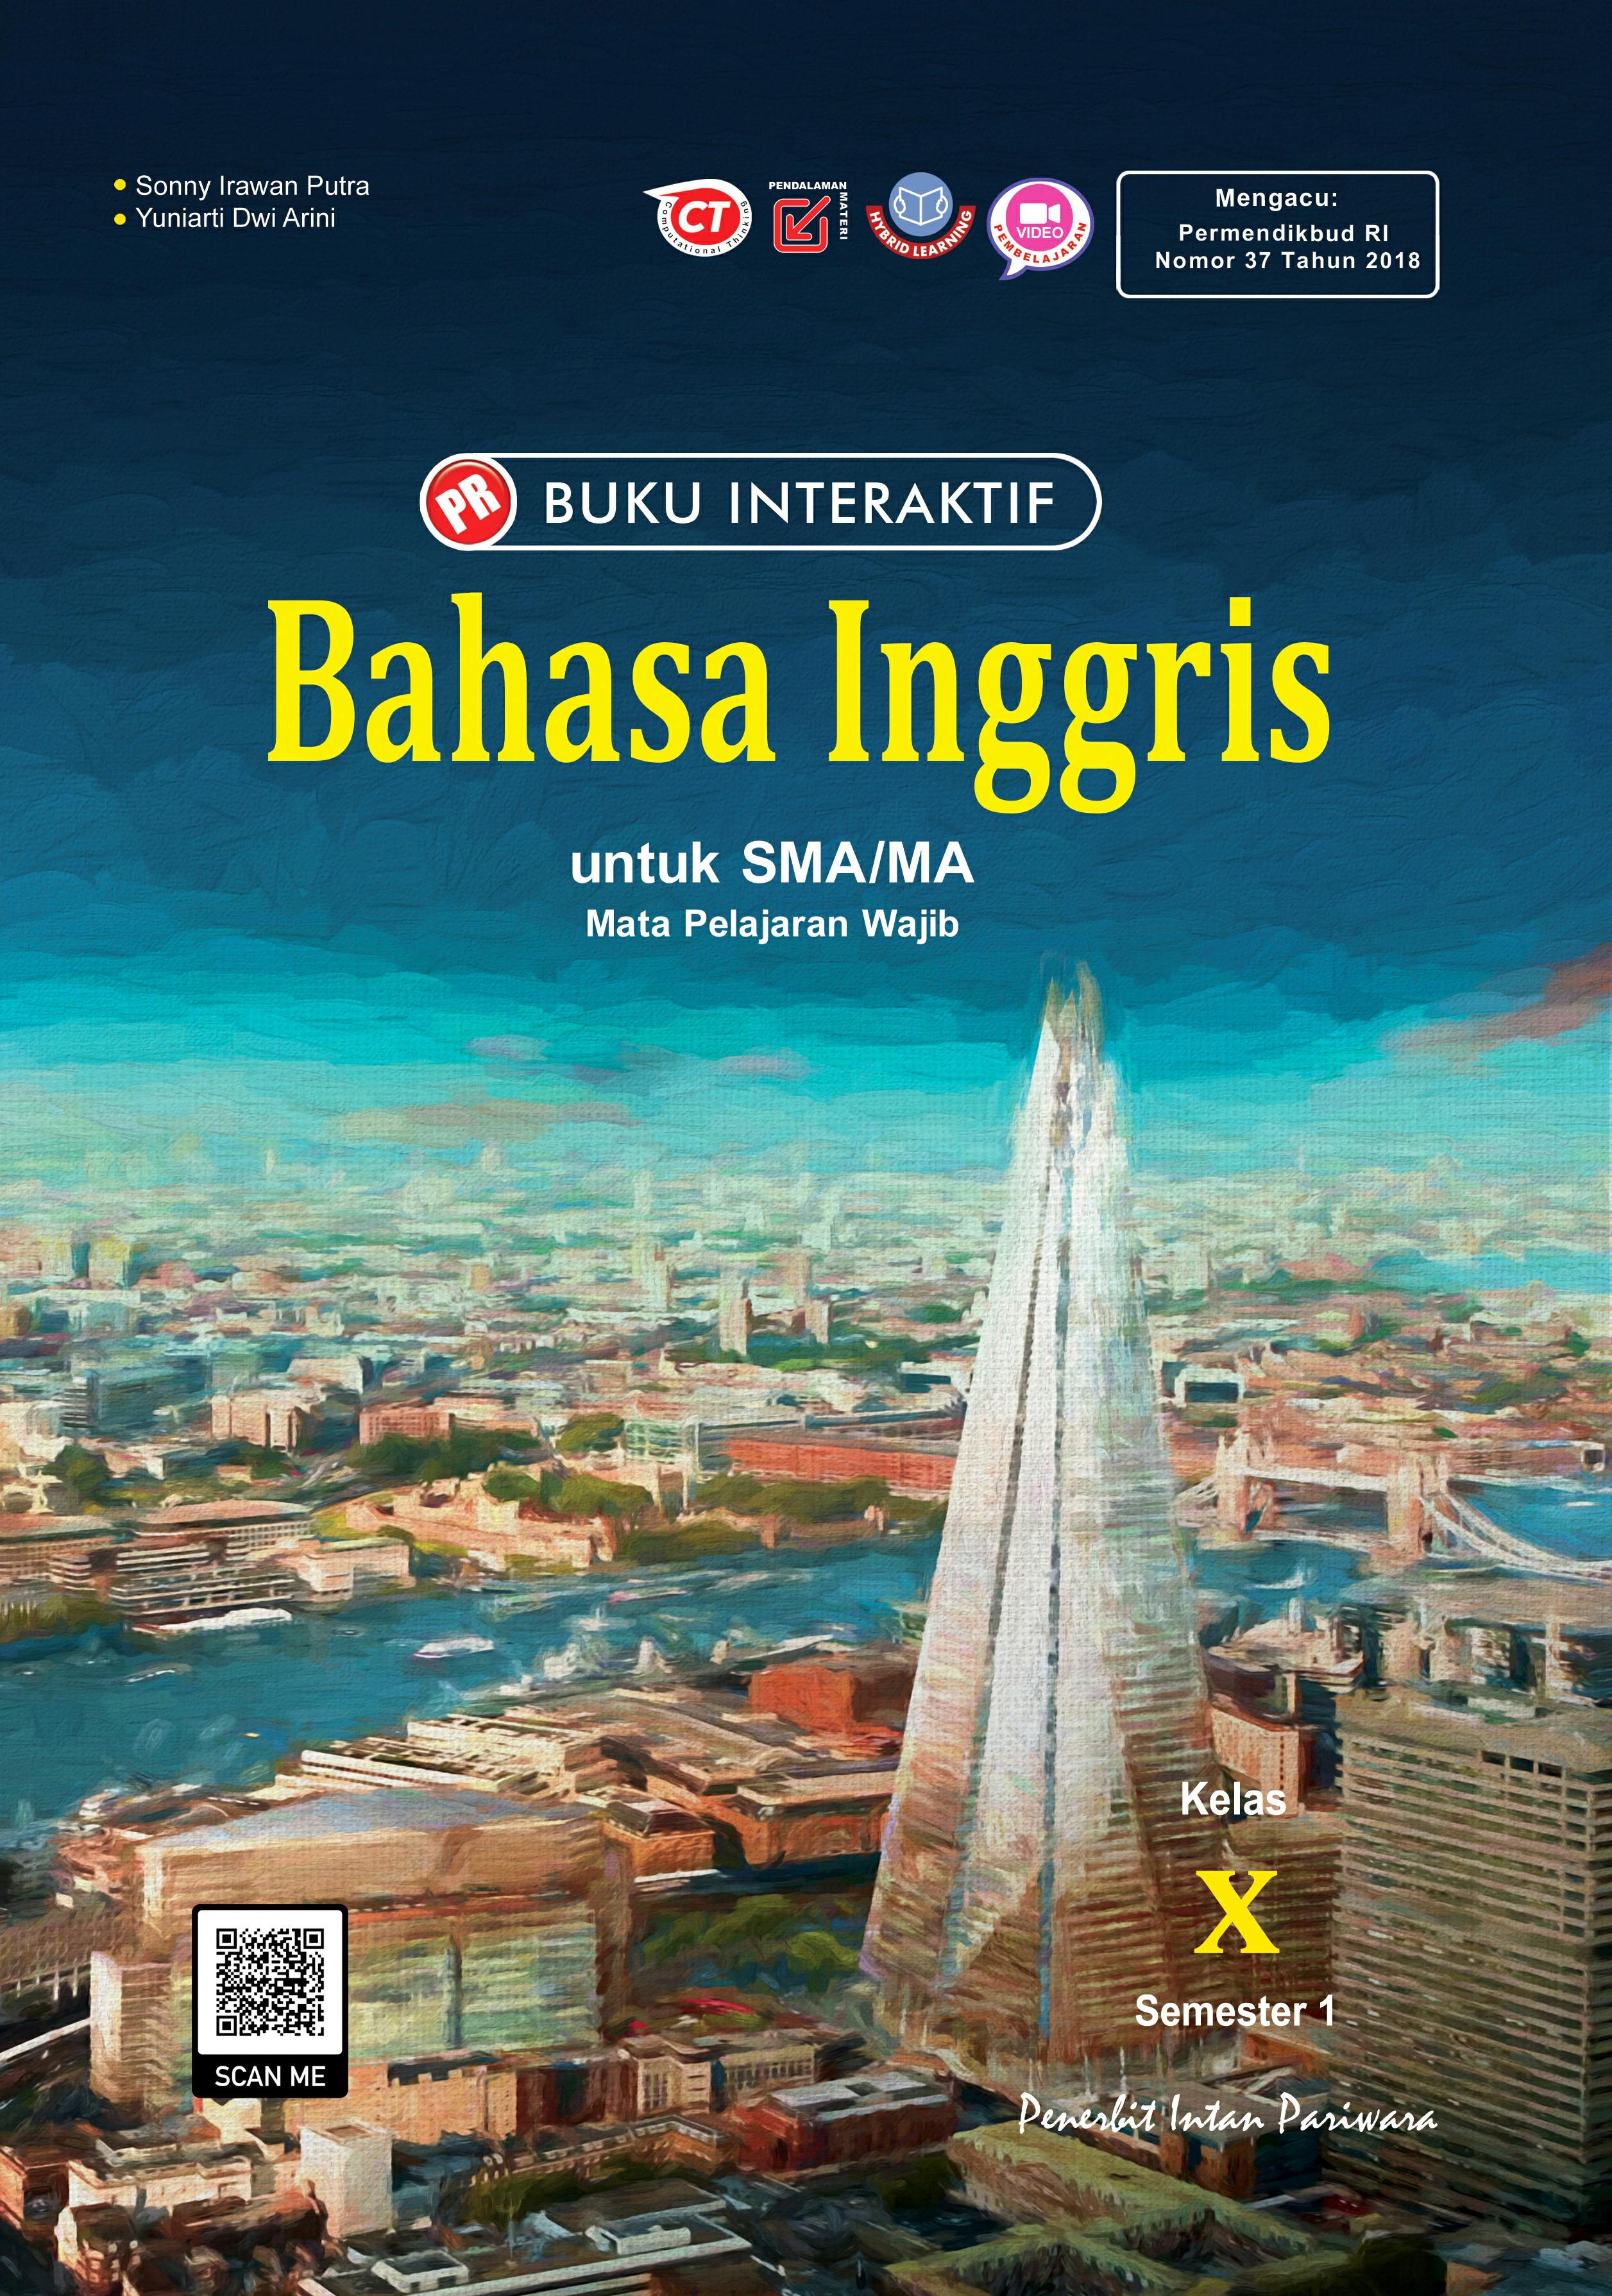 Buku Interaktif Bahasa Inggris X Semester 1